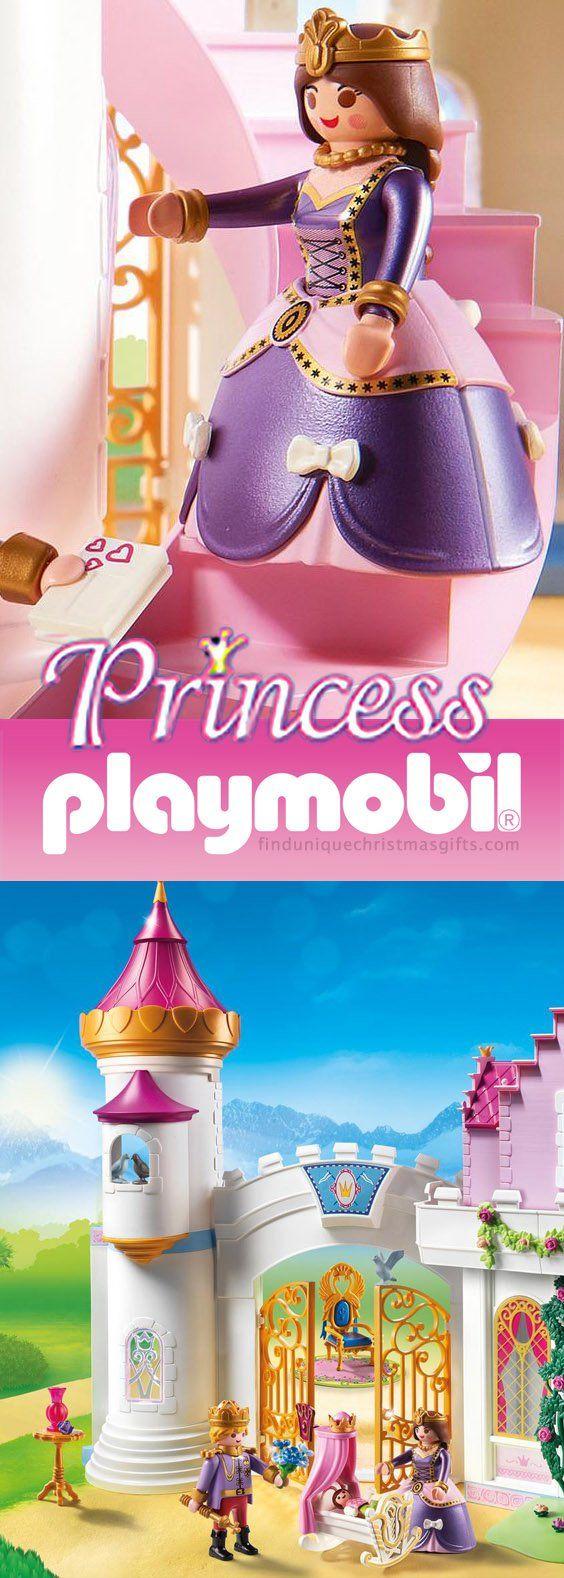 Christmas Gift Ideas Playmobil Princess